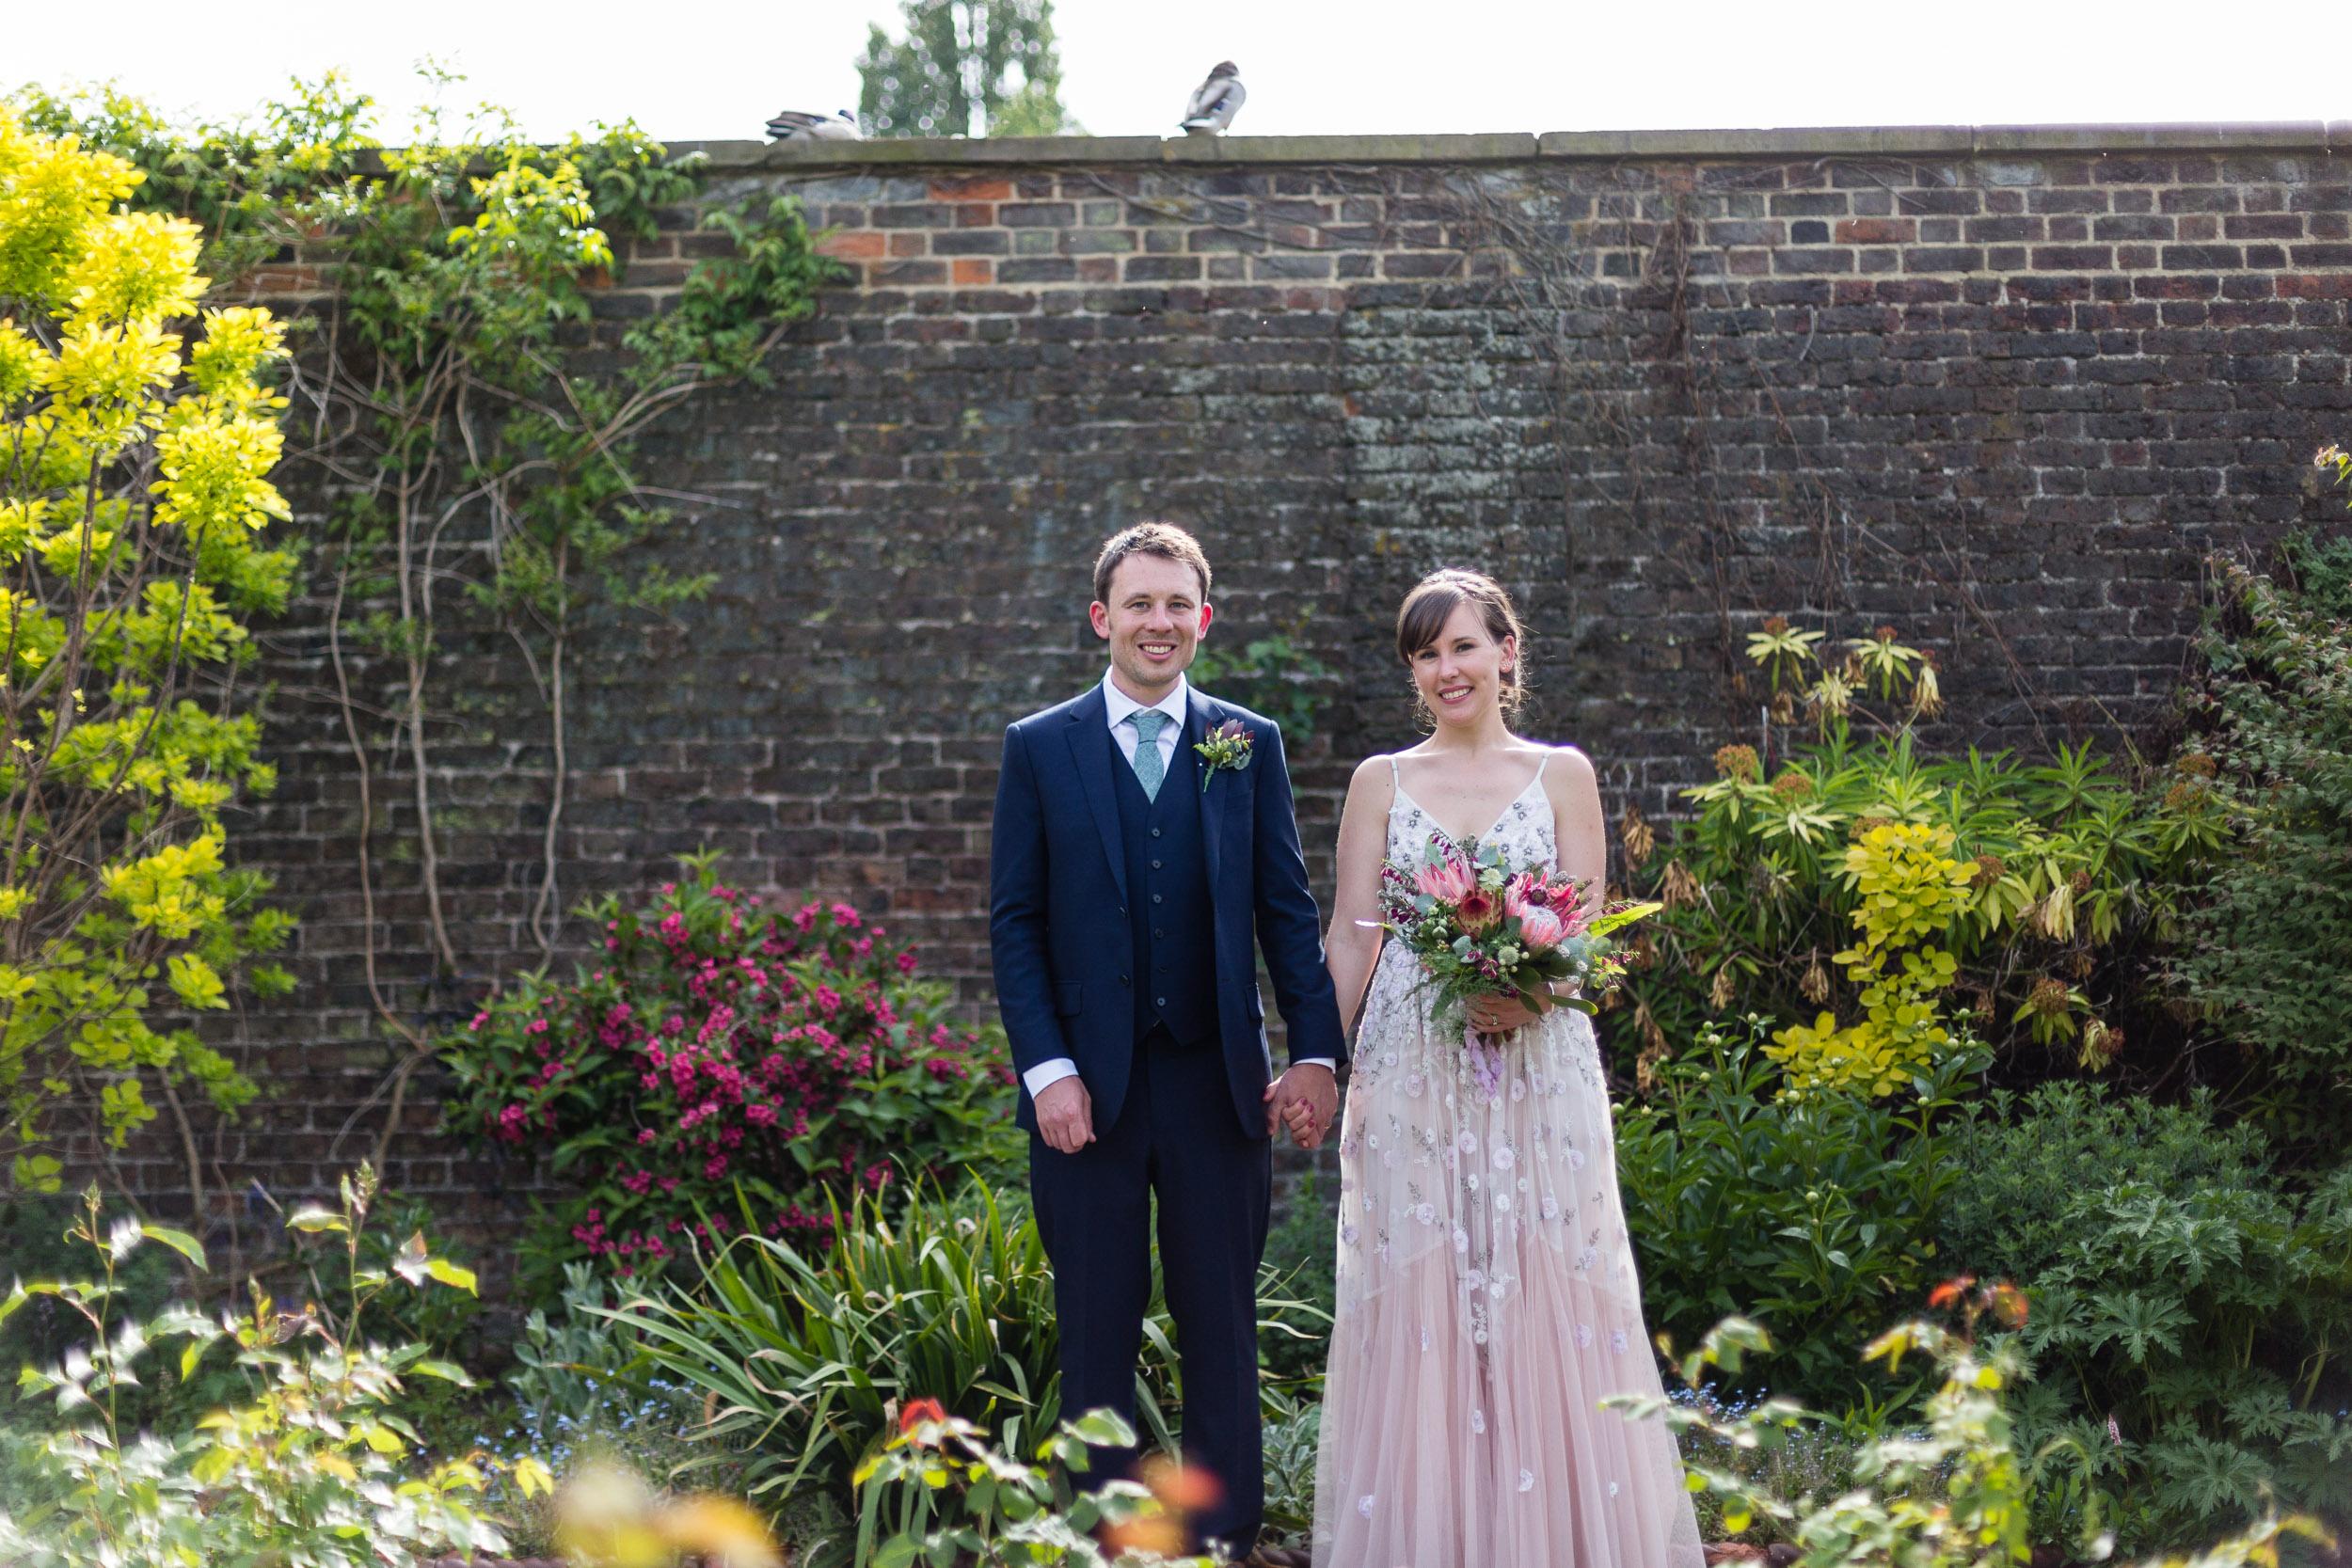 brockwell-lido-brixton-herne-hill-wedding-274.jpg